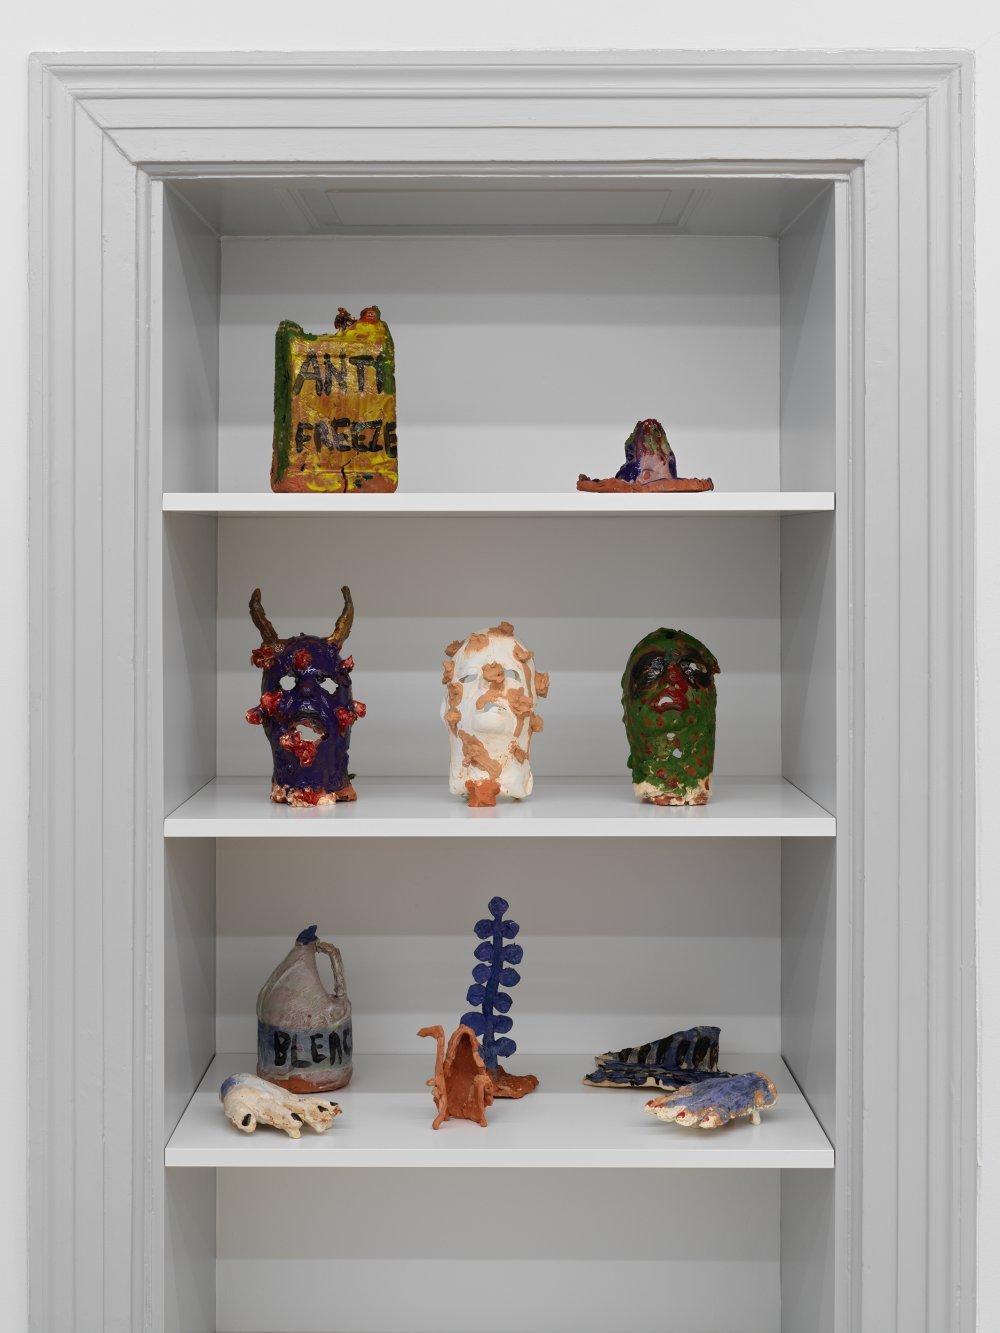 Galerie Eva Presenhuber Josh Smith 16